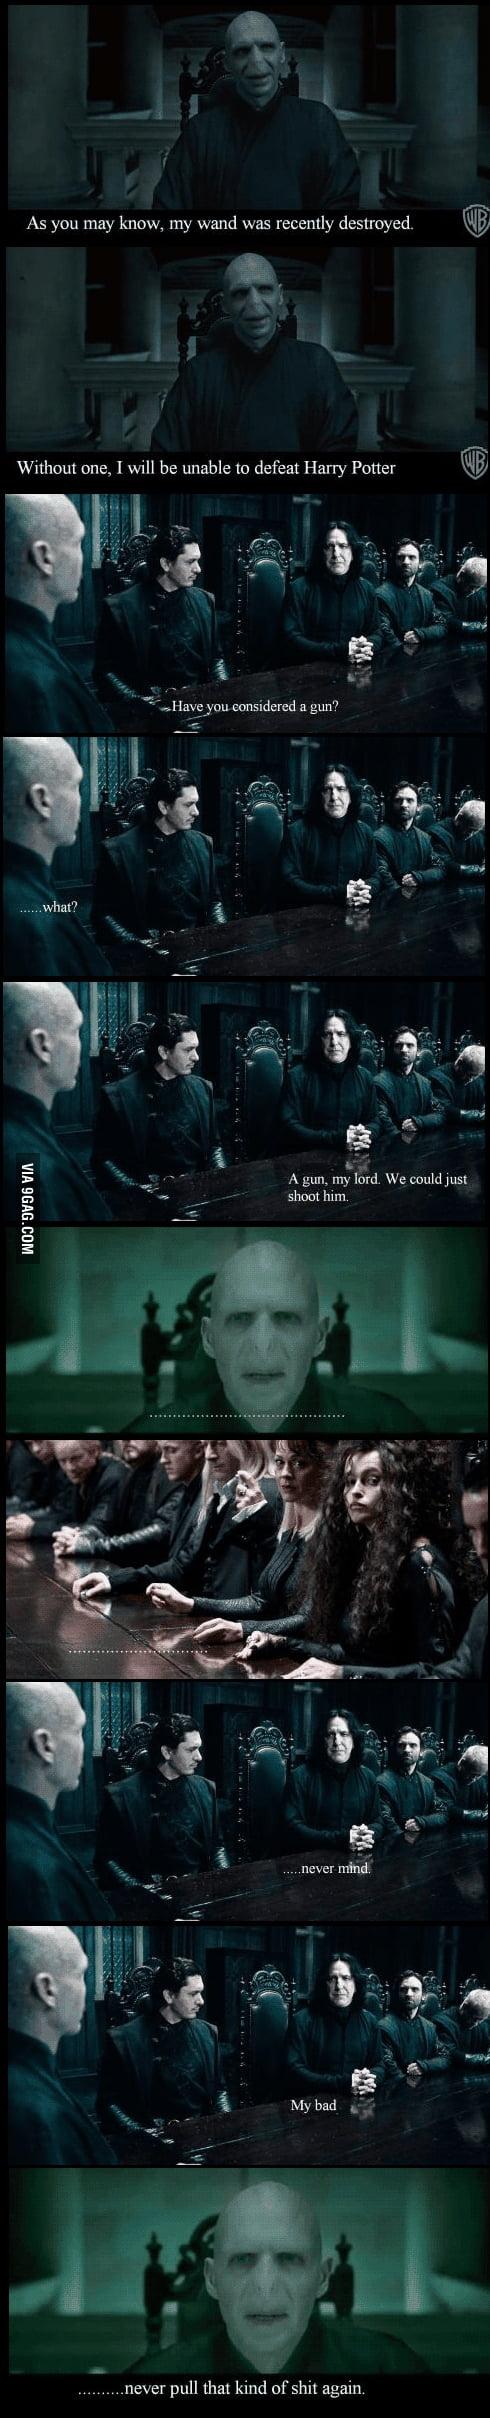 Just Severus Snape